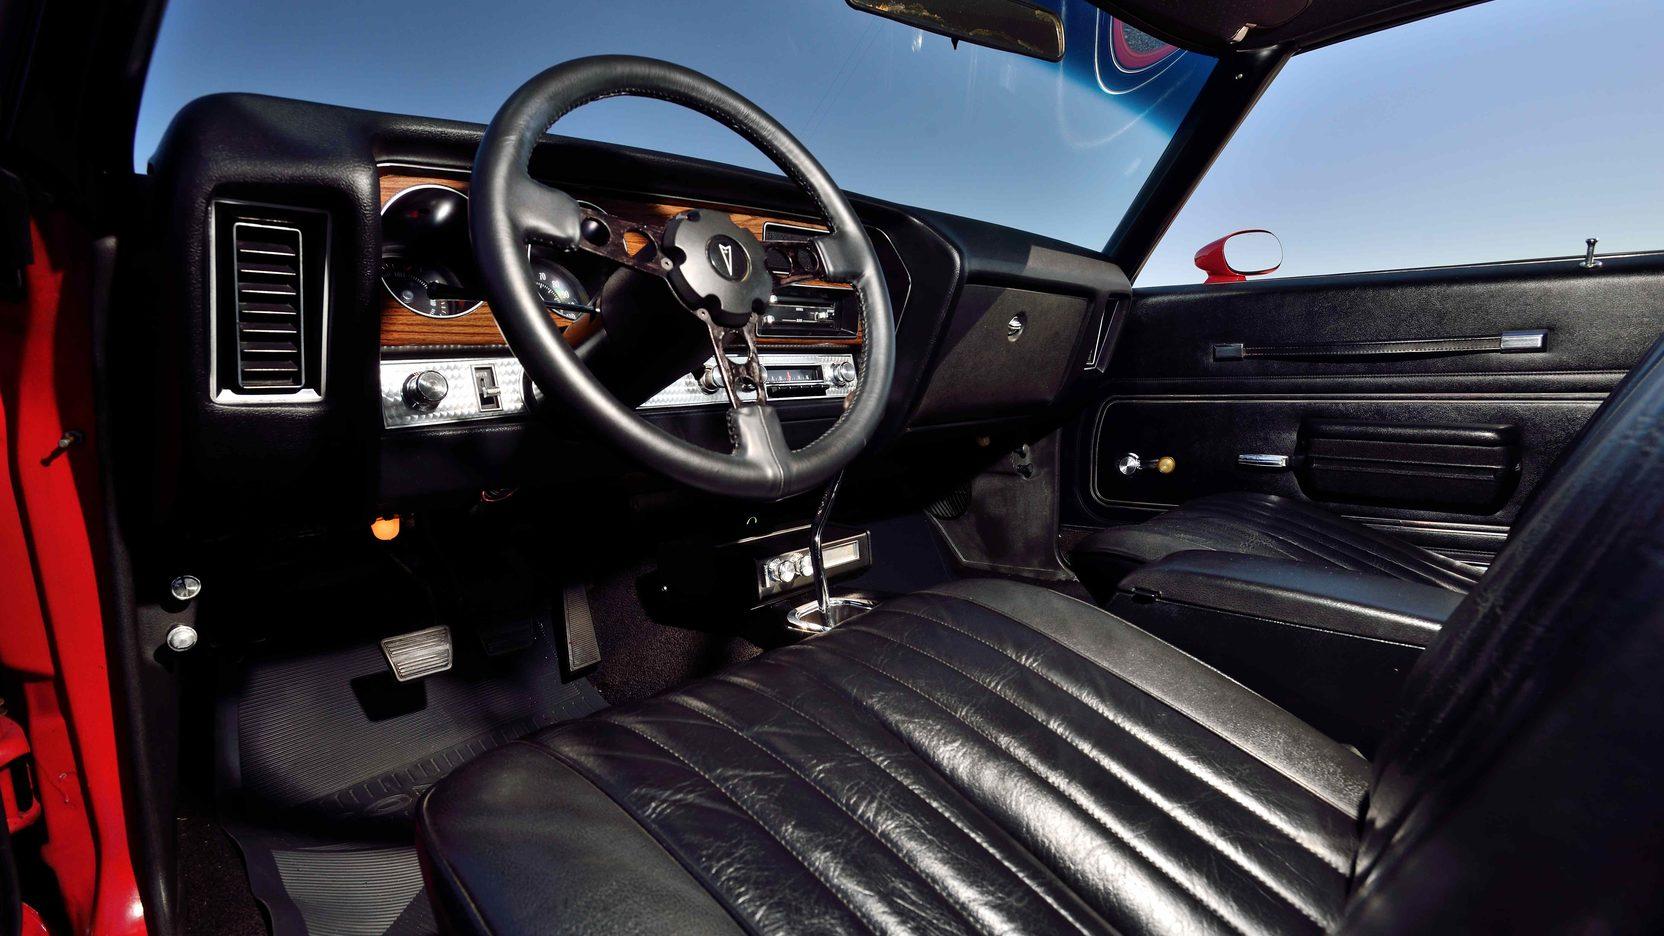 1972 Pontiac GTO interior drivers